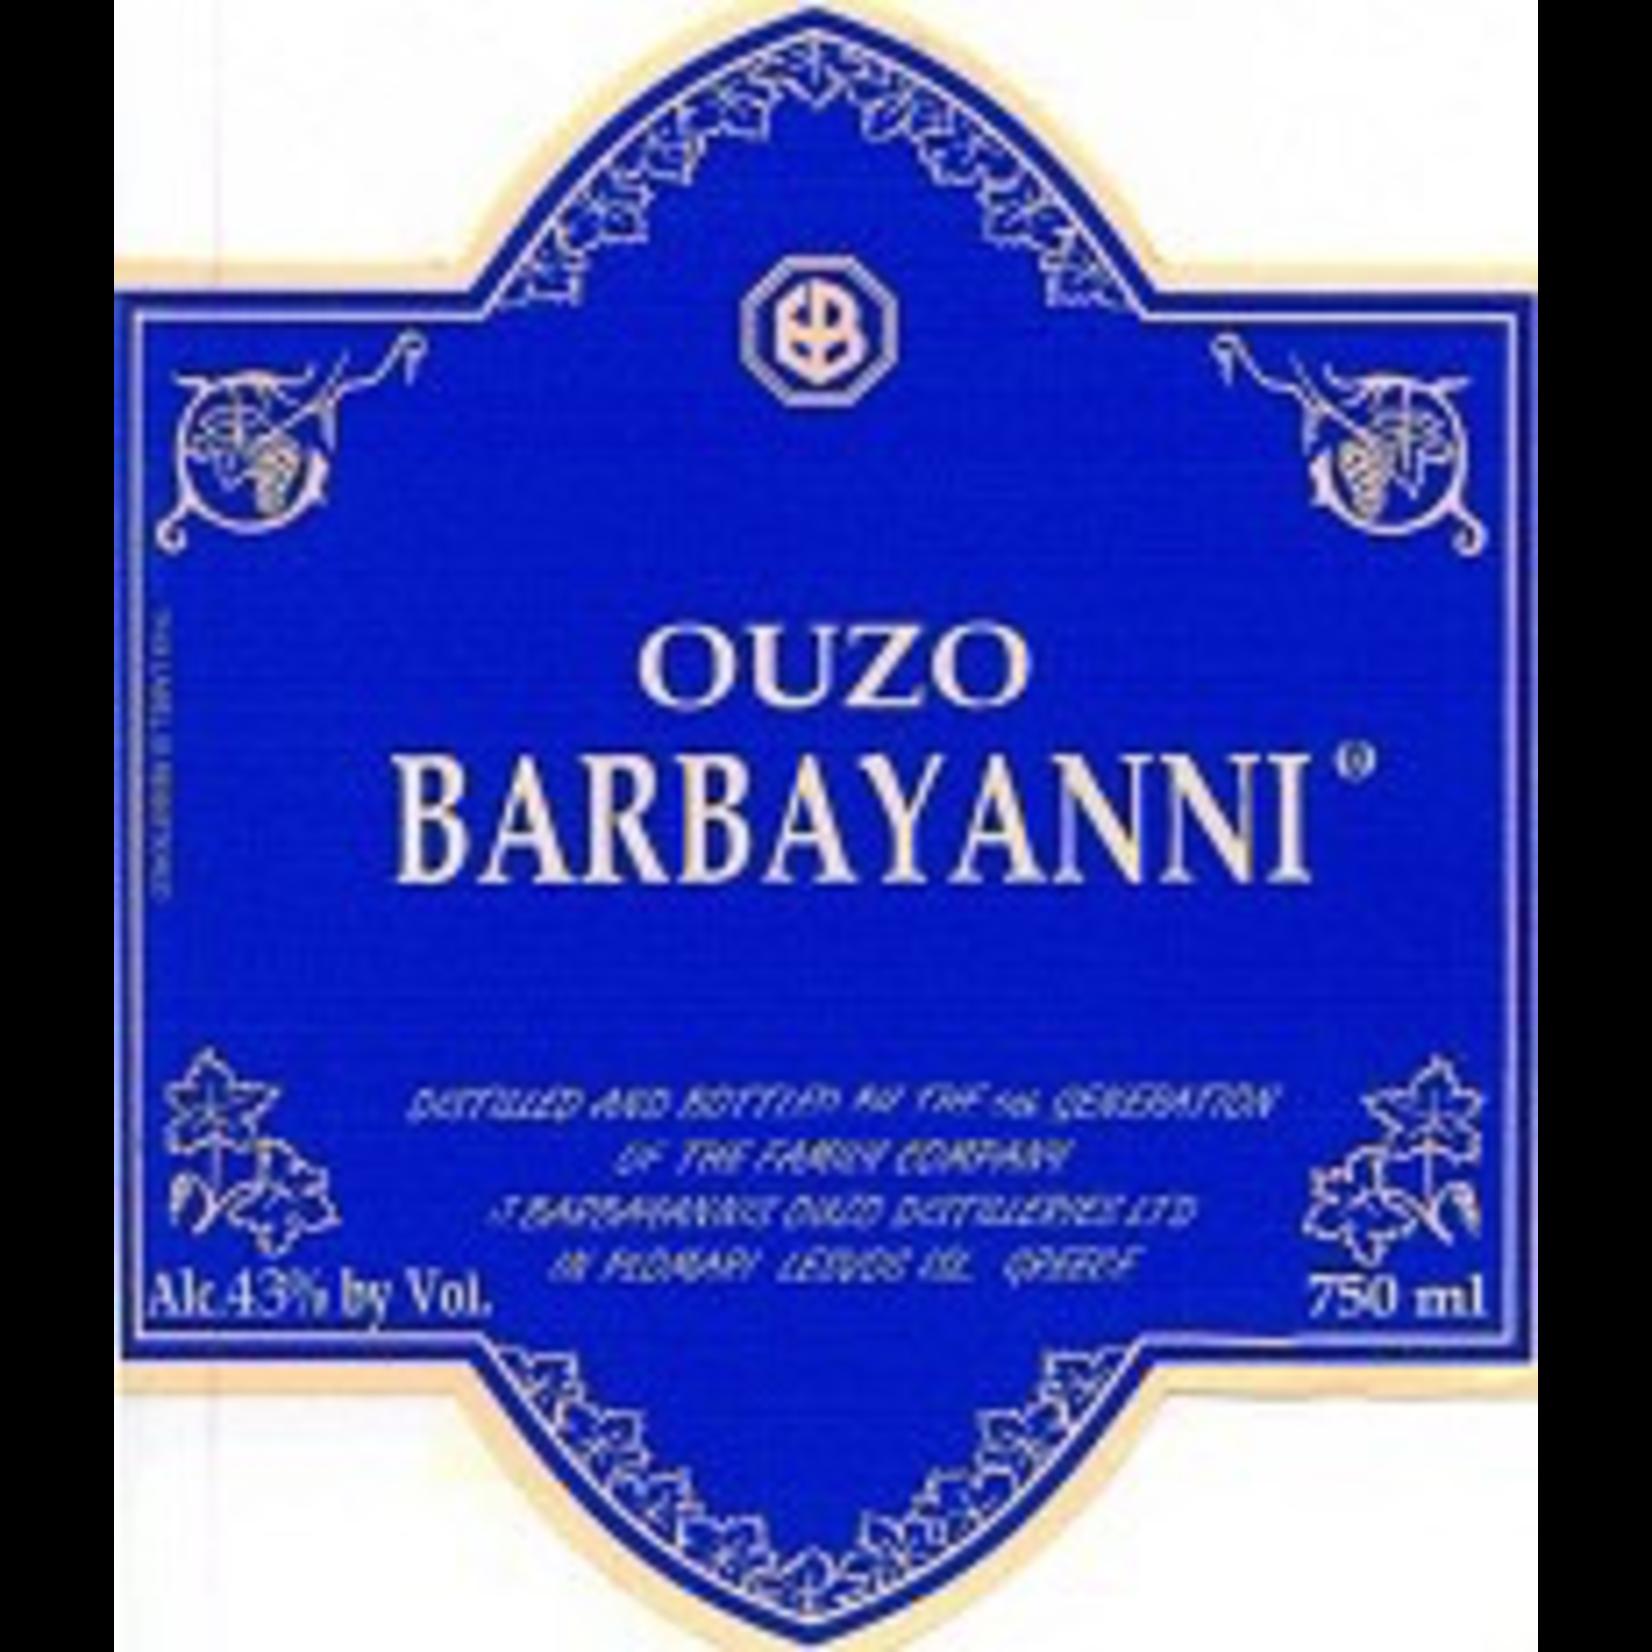 Barbayanni Ouzo Blue